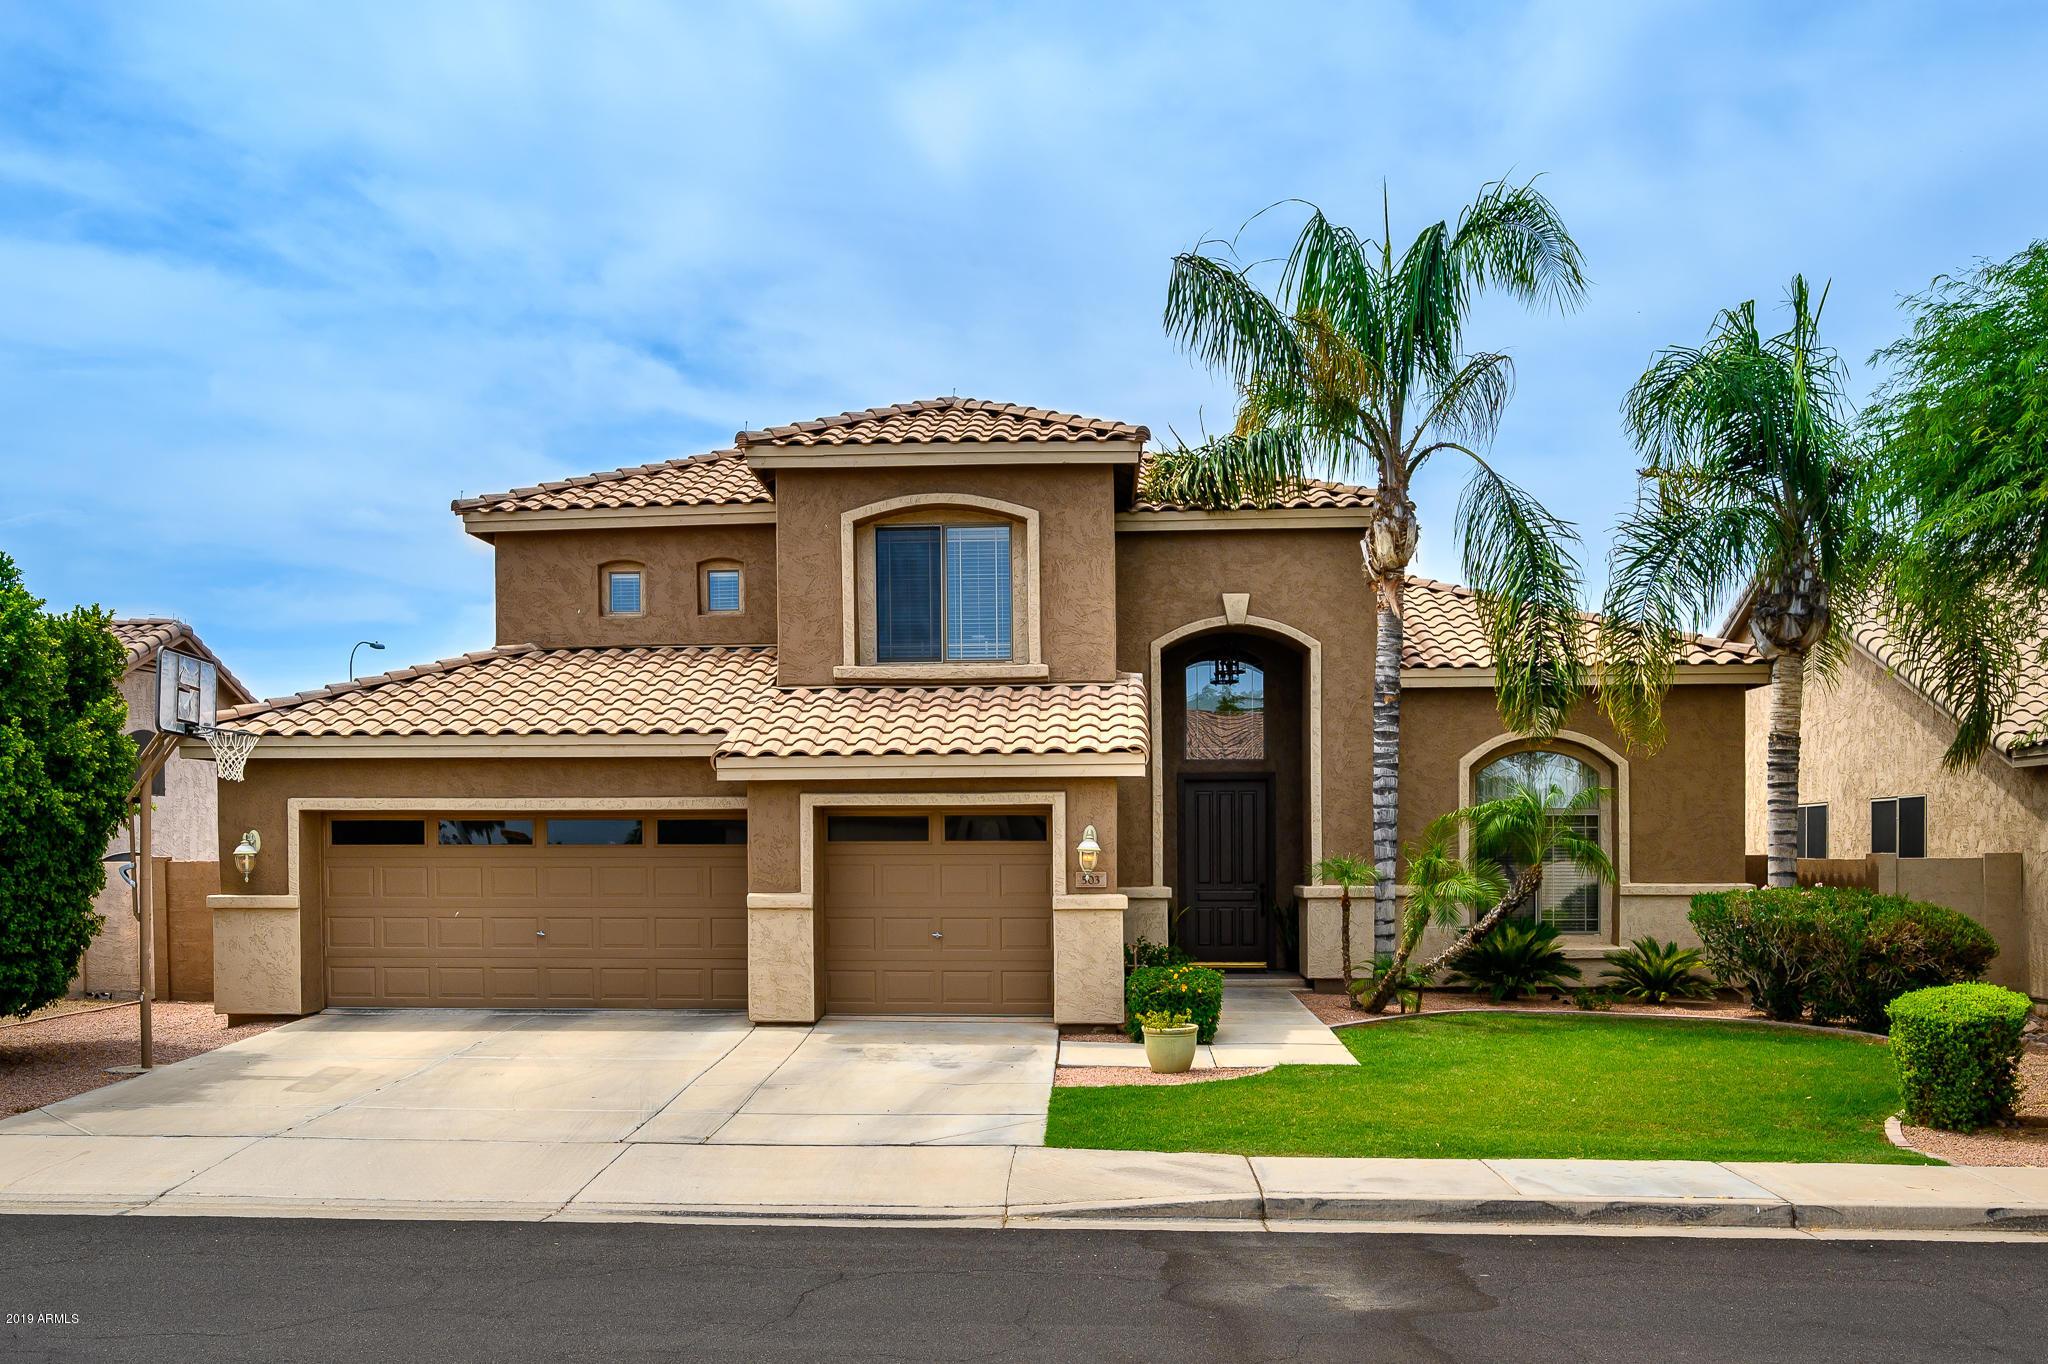 Photo of 503 W Bluejay Drive, Chandler, AZ 85286